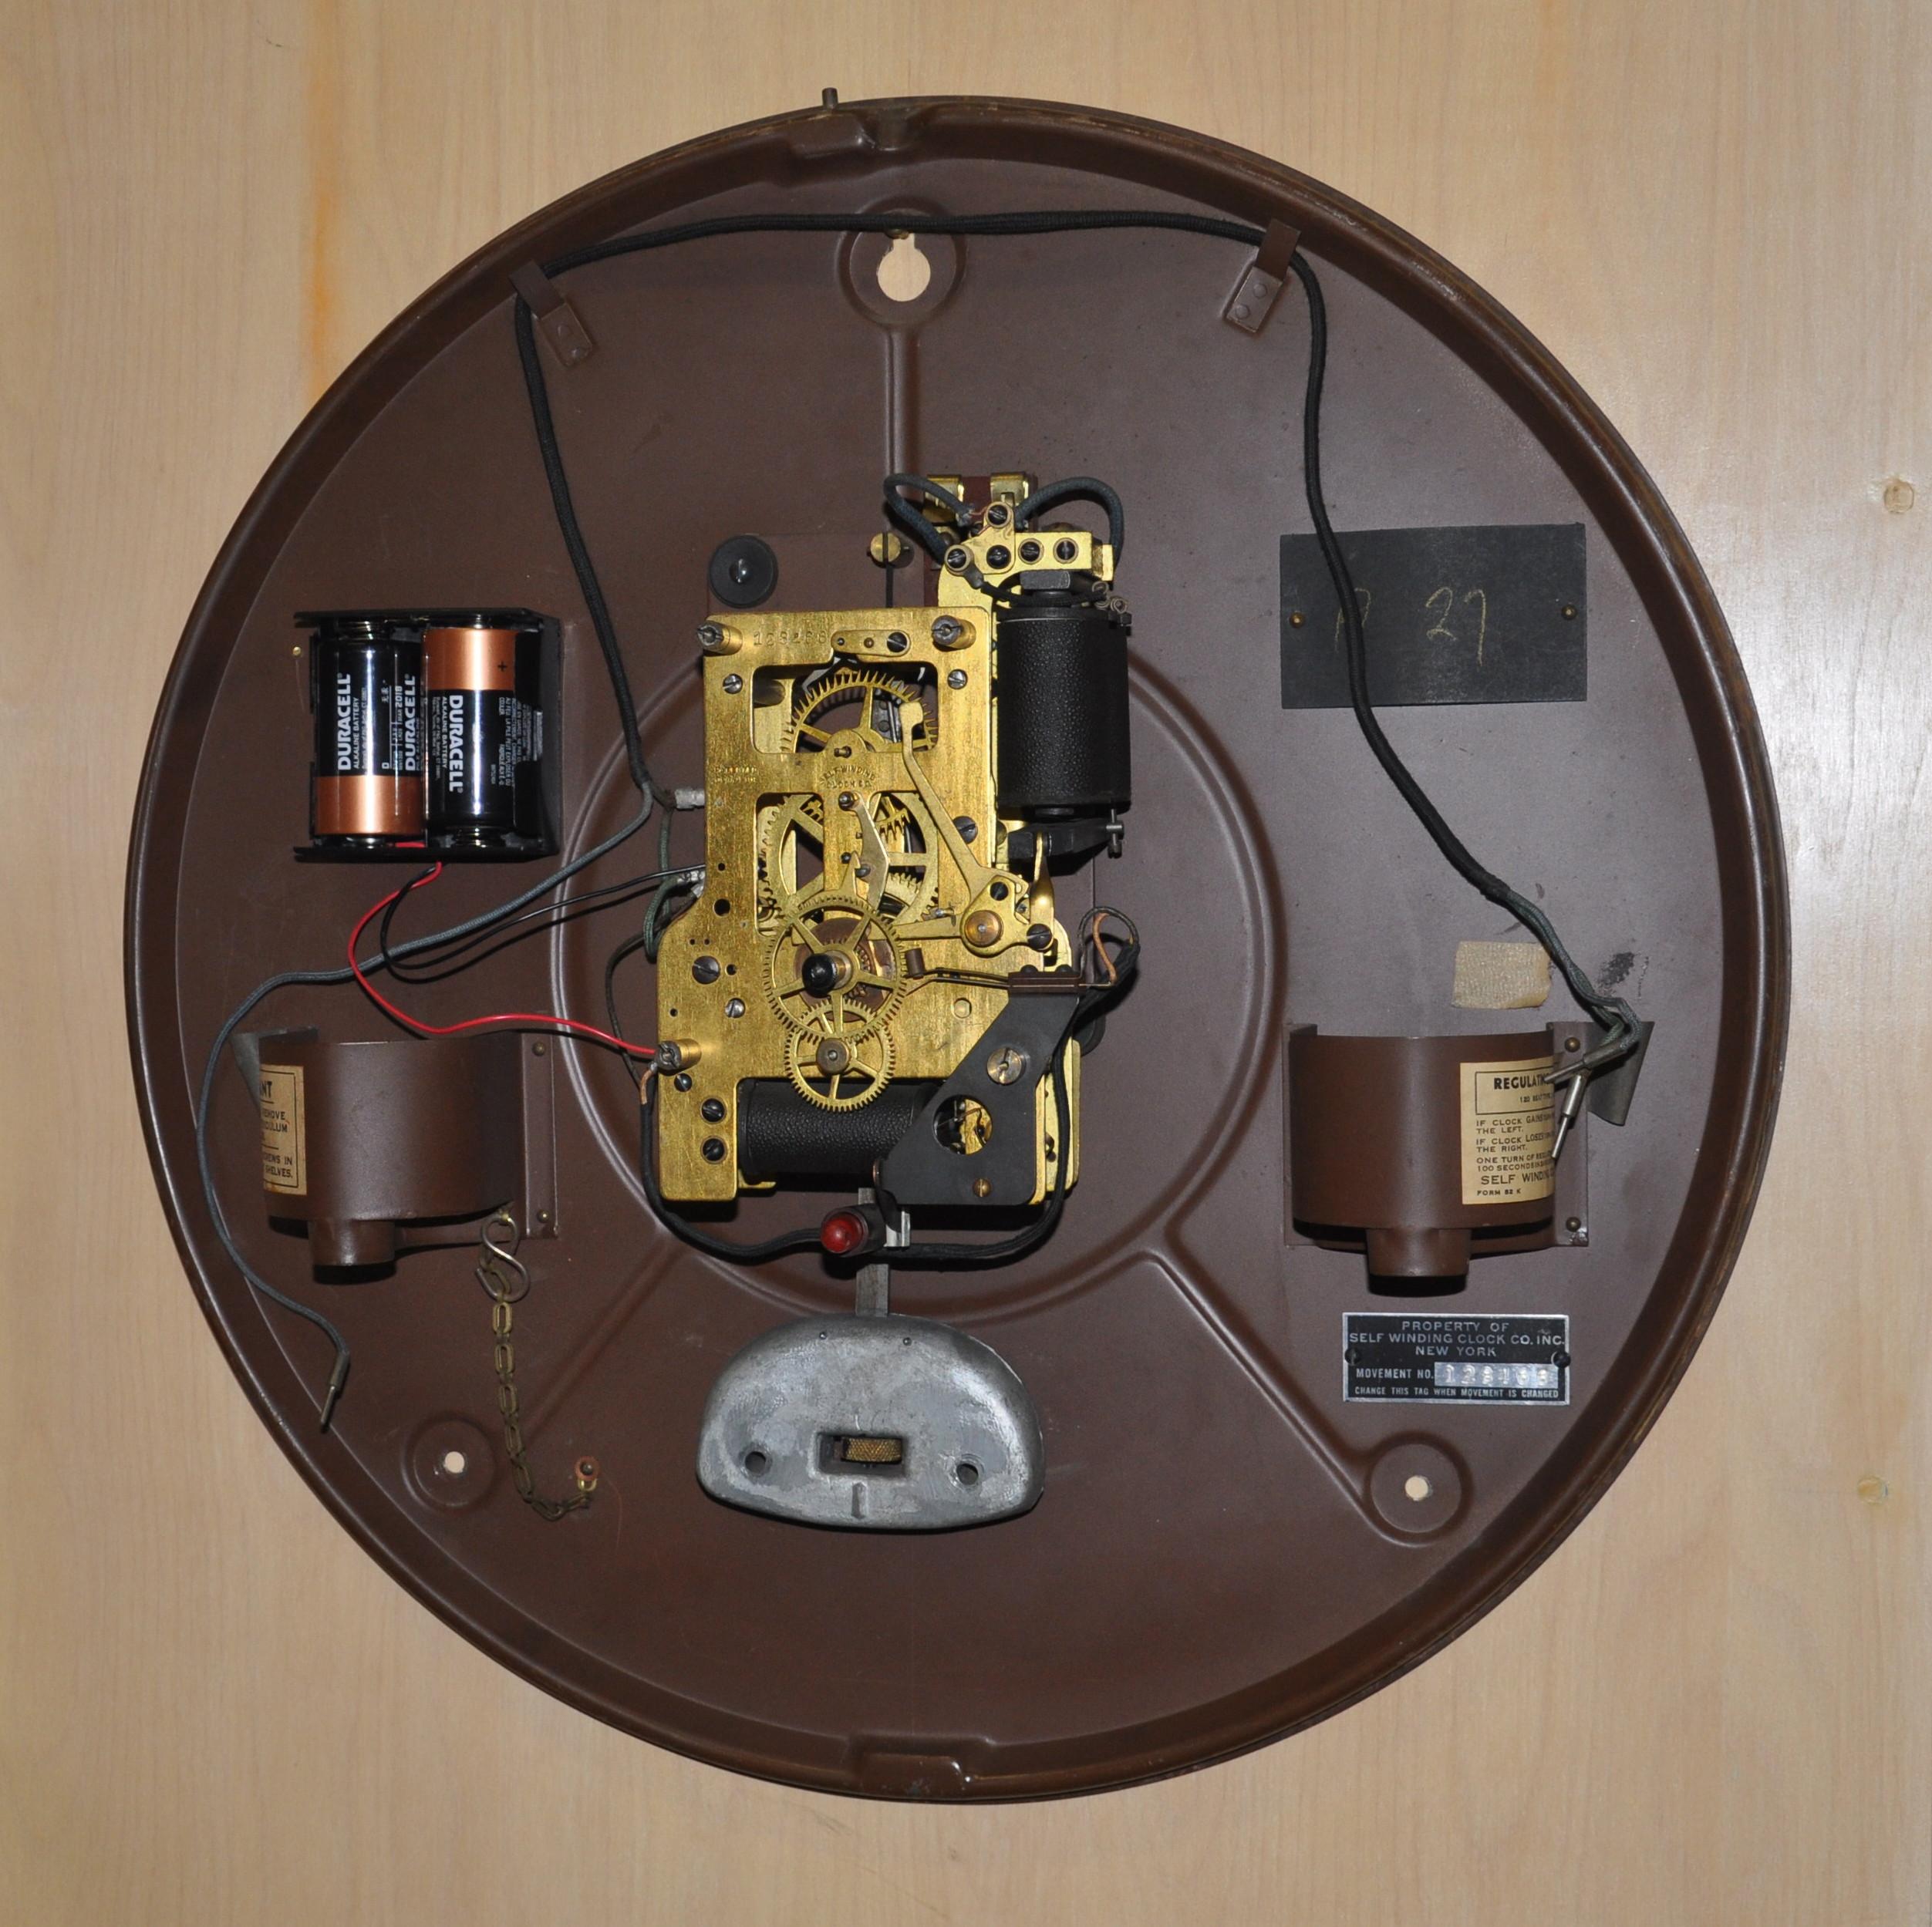 motor starter capacitor wiring diagram images 480 motor wiring diagram on mag weg motor starter wiring diagram